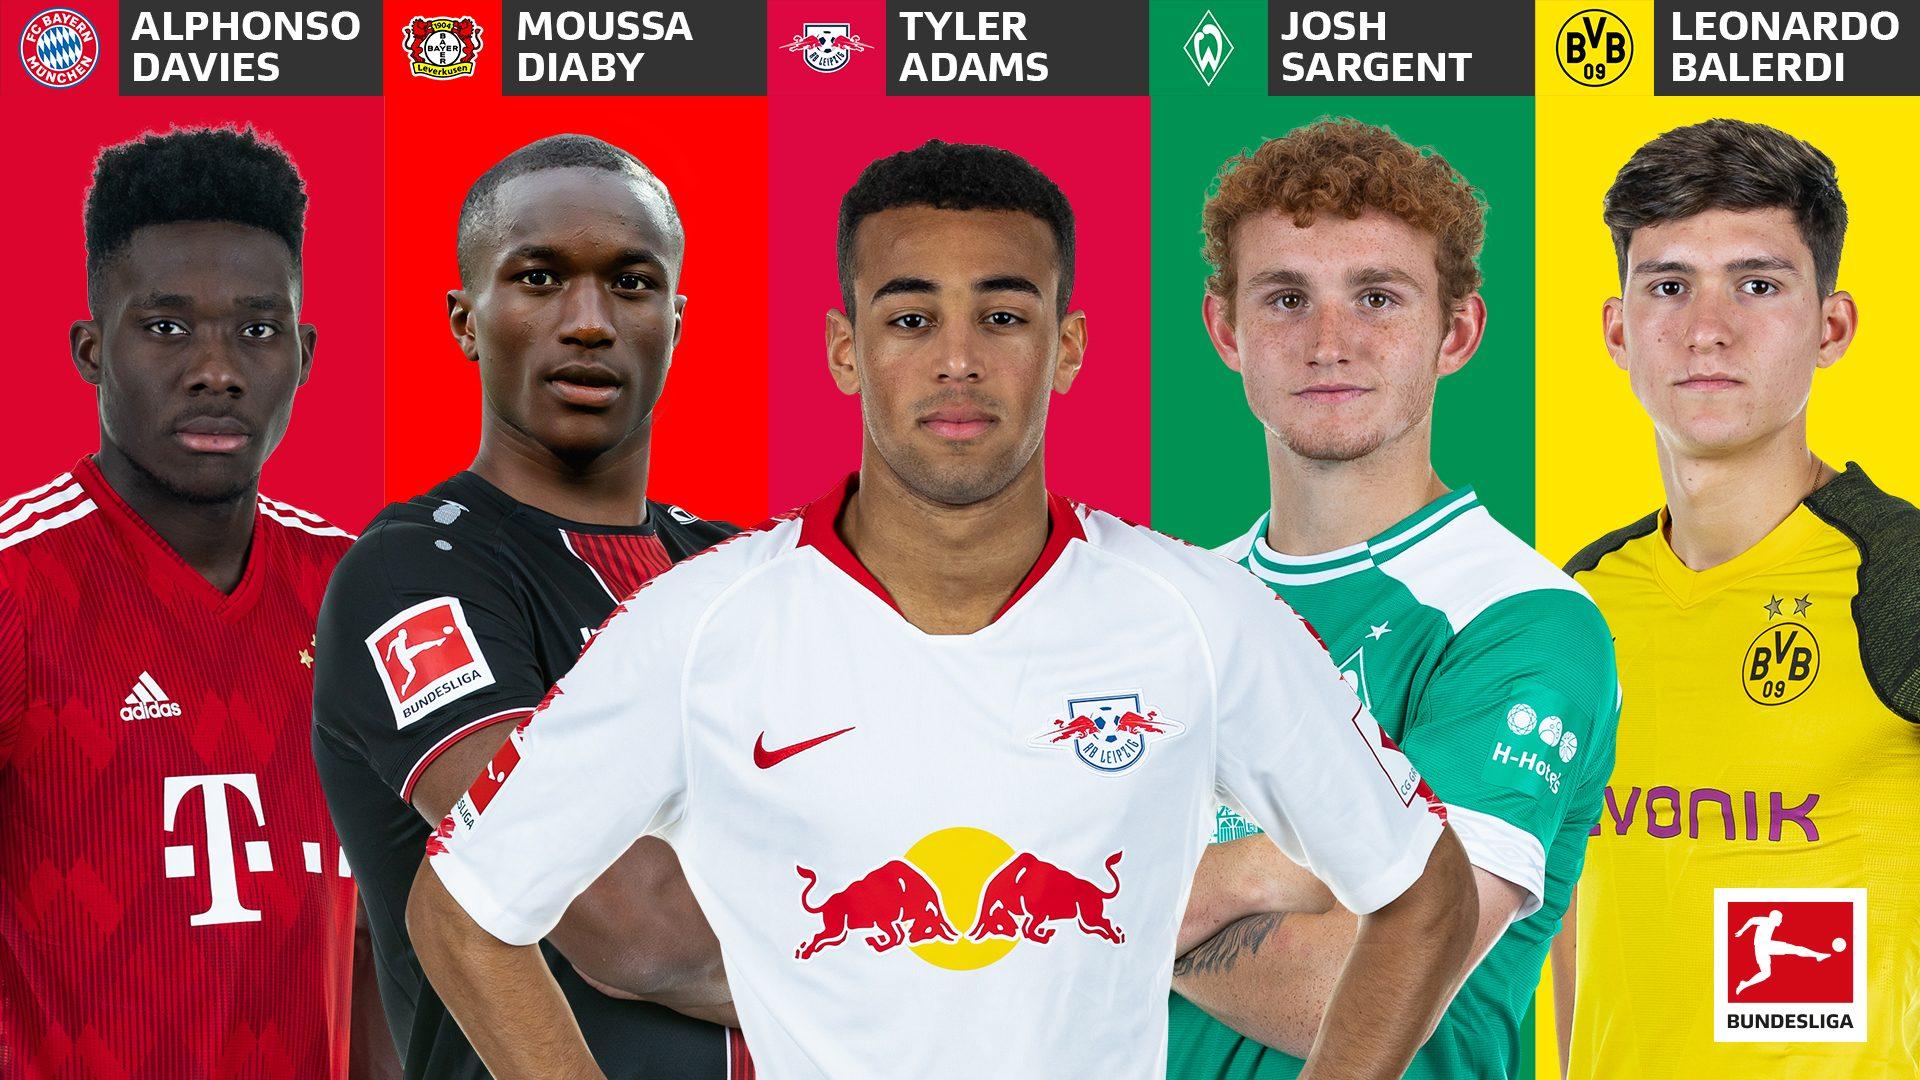 Bundesliga | Tyler Adams, Alphonso Davies and the top 5 most